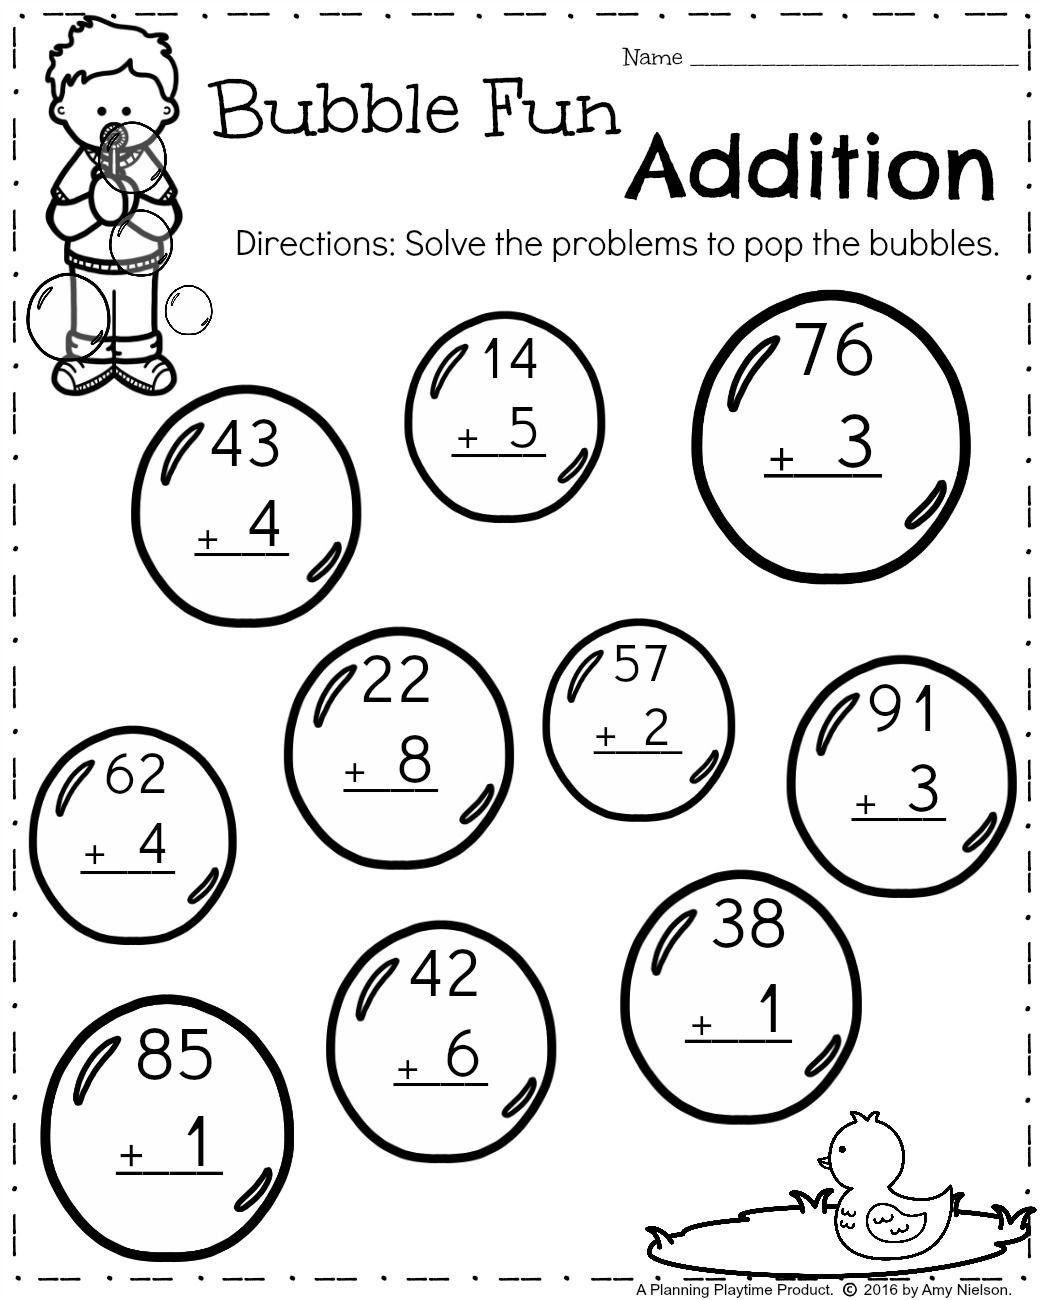 Adding Problems For 1st Graders First Grade Worksheets For Spring First Grade Math Worksheets 1st Grade Math Worksheets Maths Worksheets Ks2 Adding digit numbers worksheet ks1